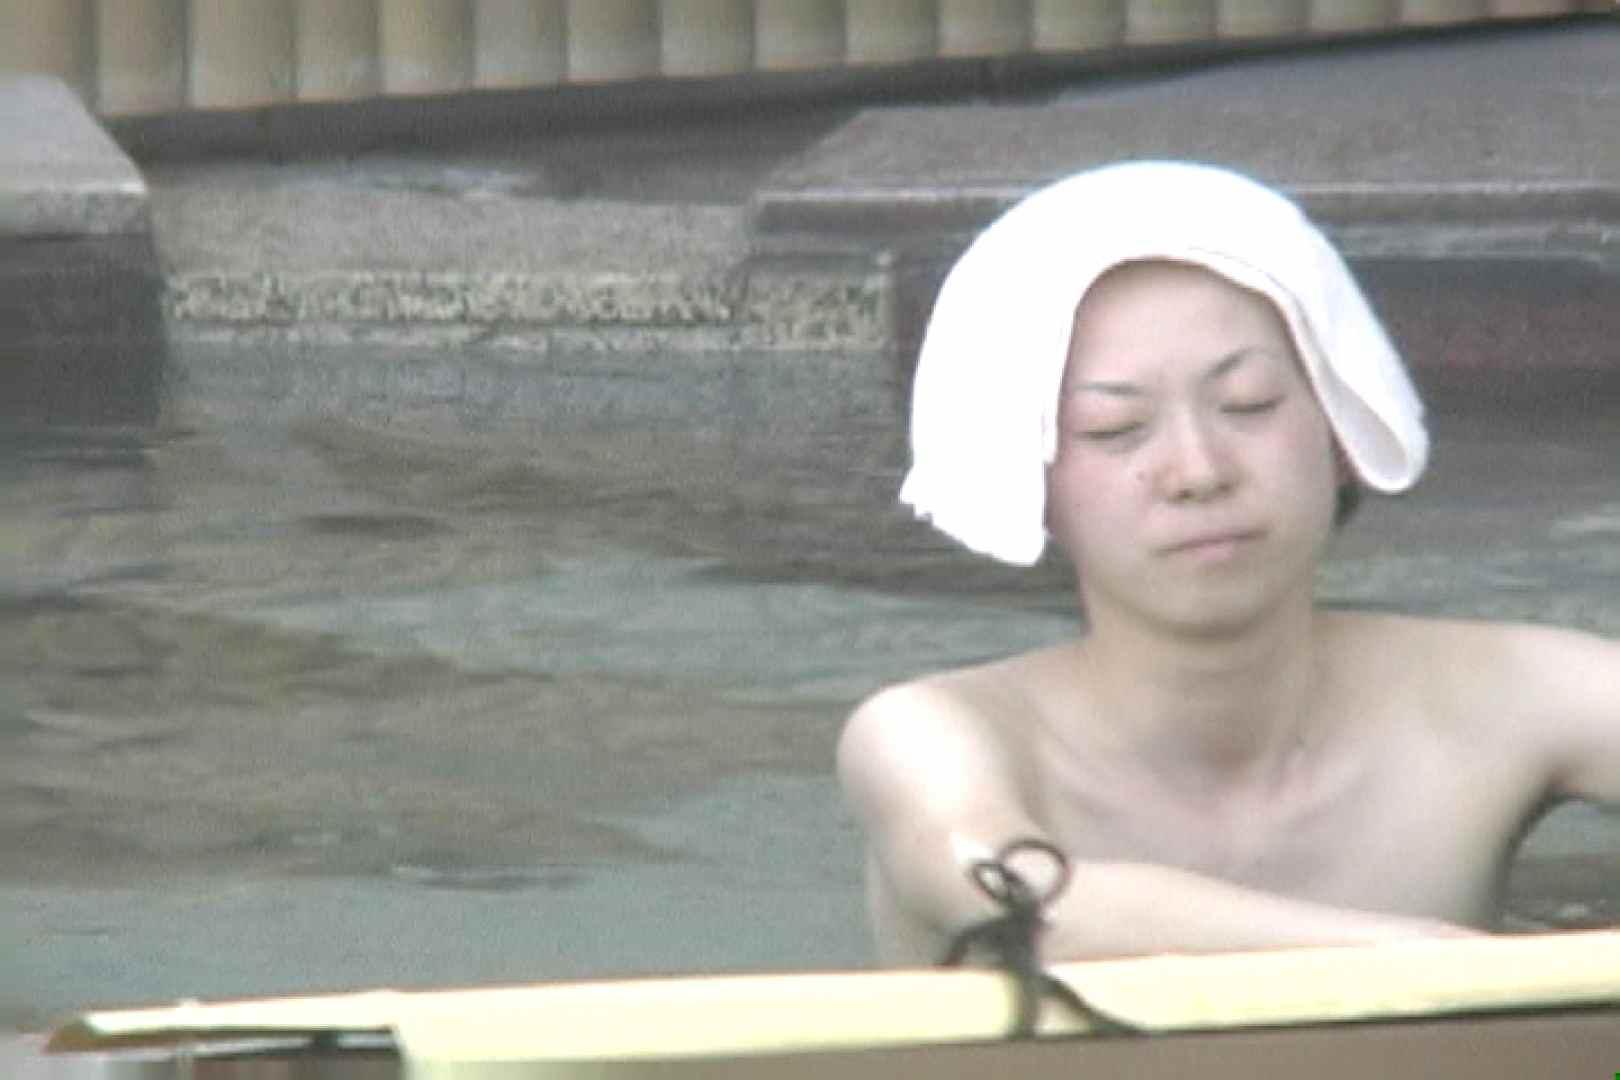 Aquaな露天風呂Vol.693 露天風呂編 | 盗撮シリーズ  105PIX 105